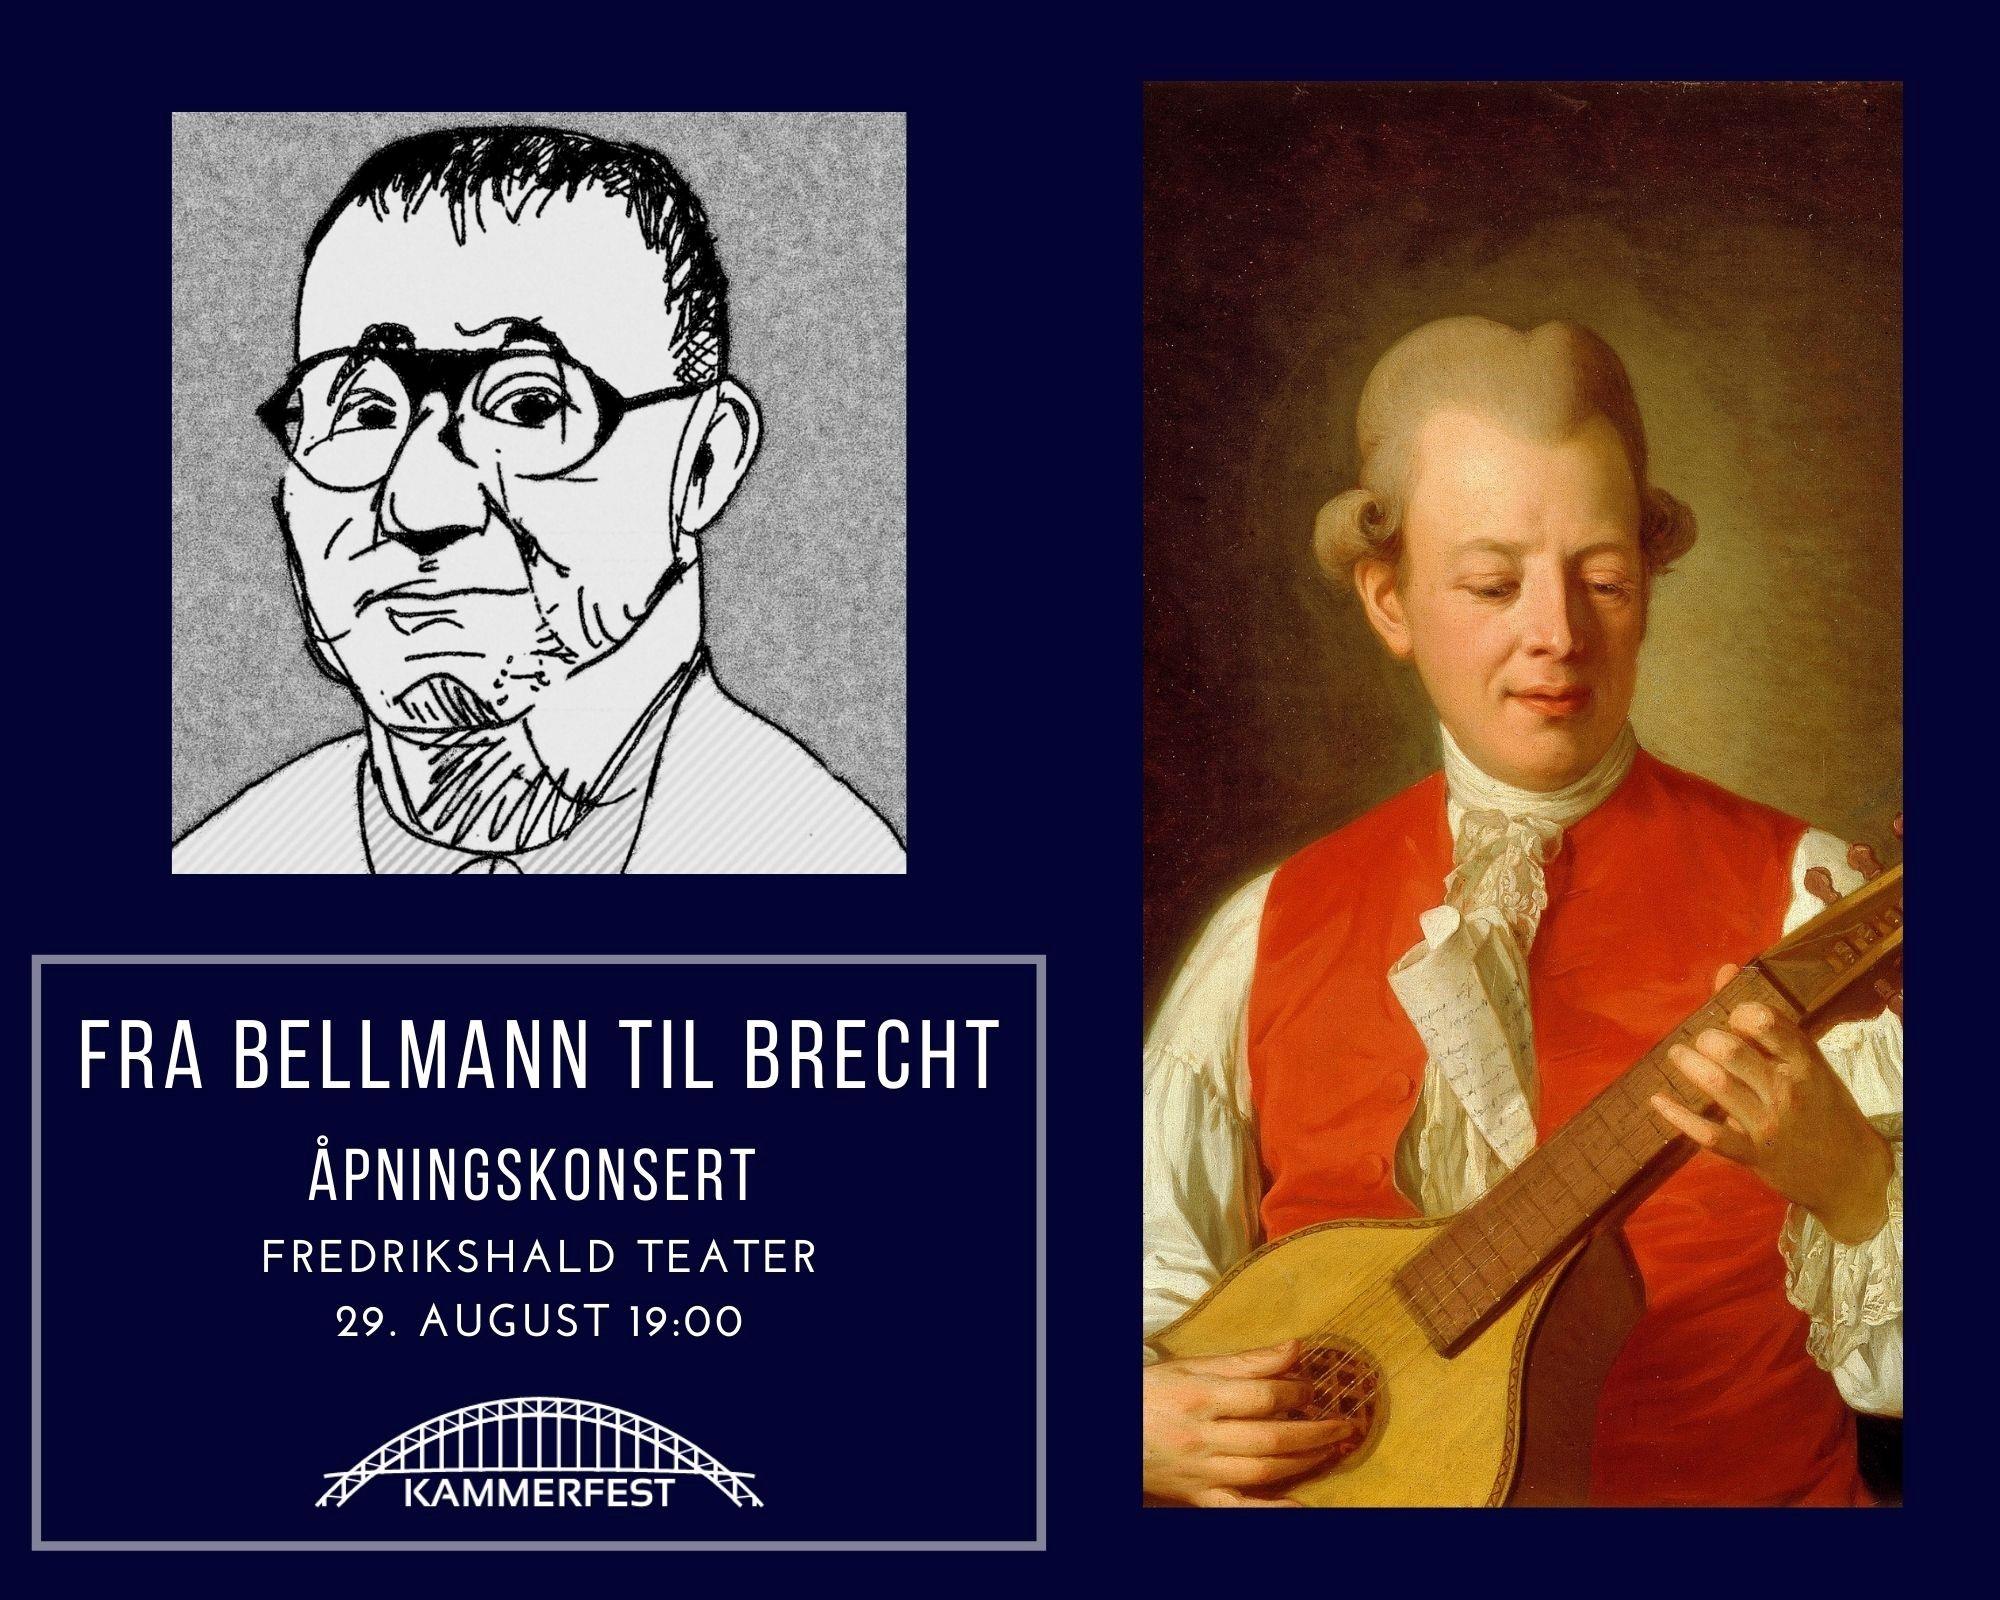 Fra Bellman til Brecht